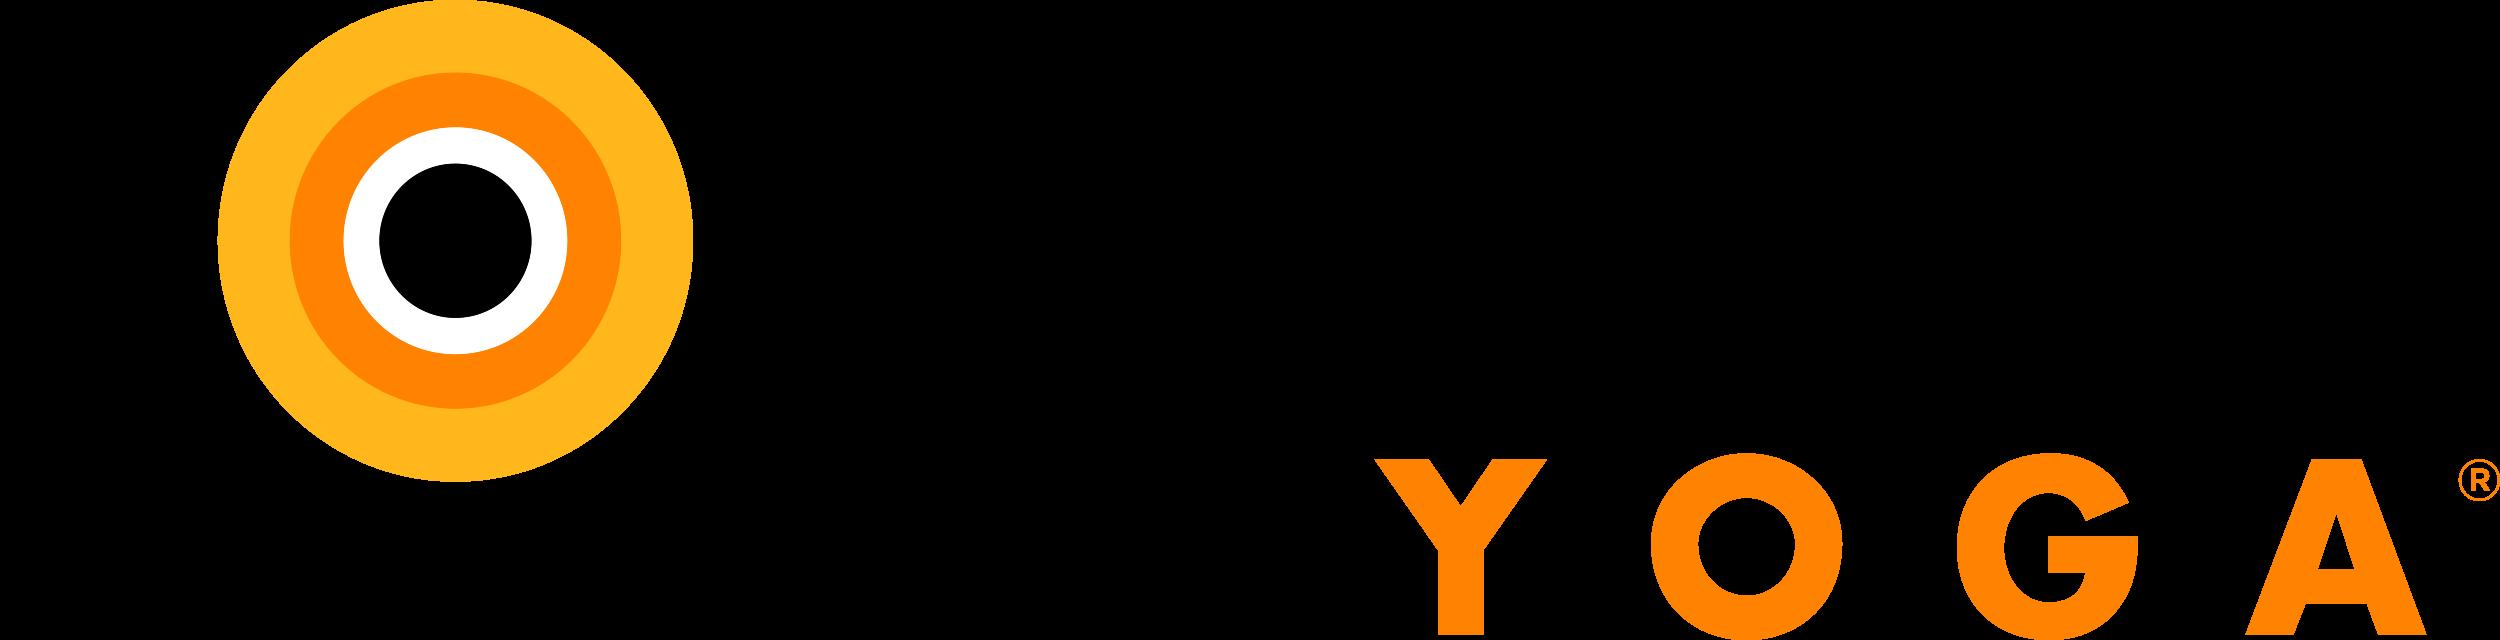 logo20171127-15264-1v0s3ts.png